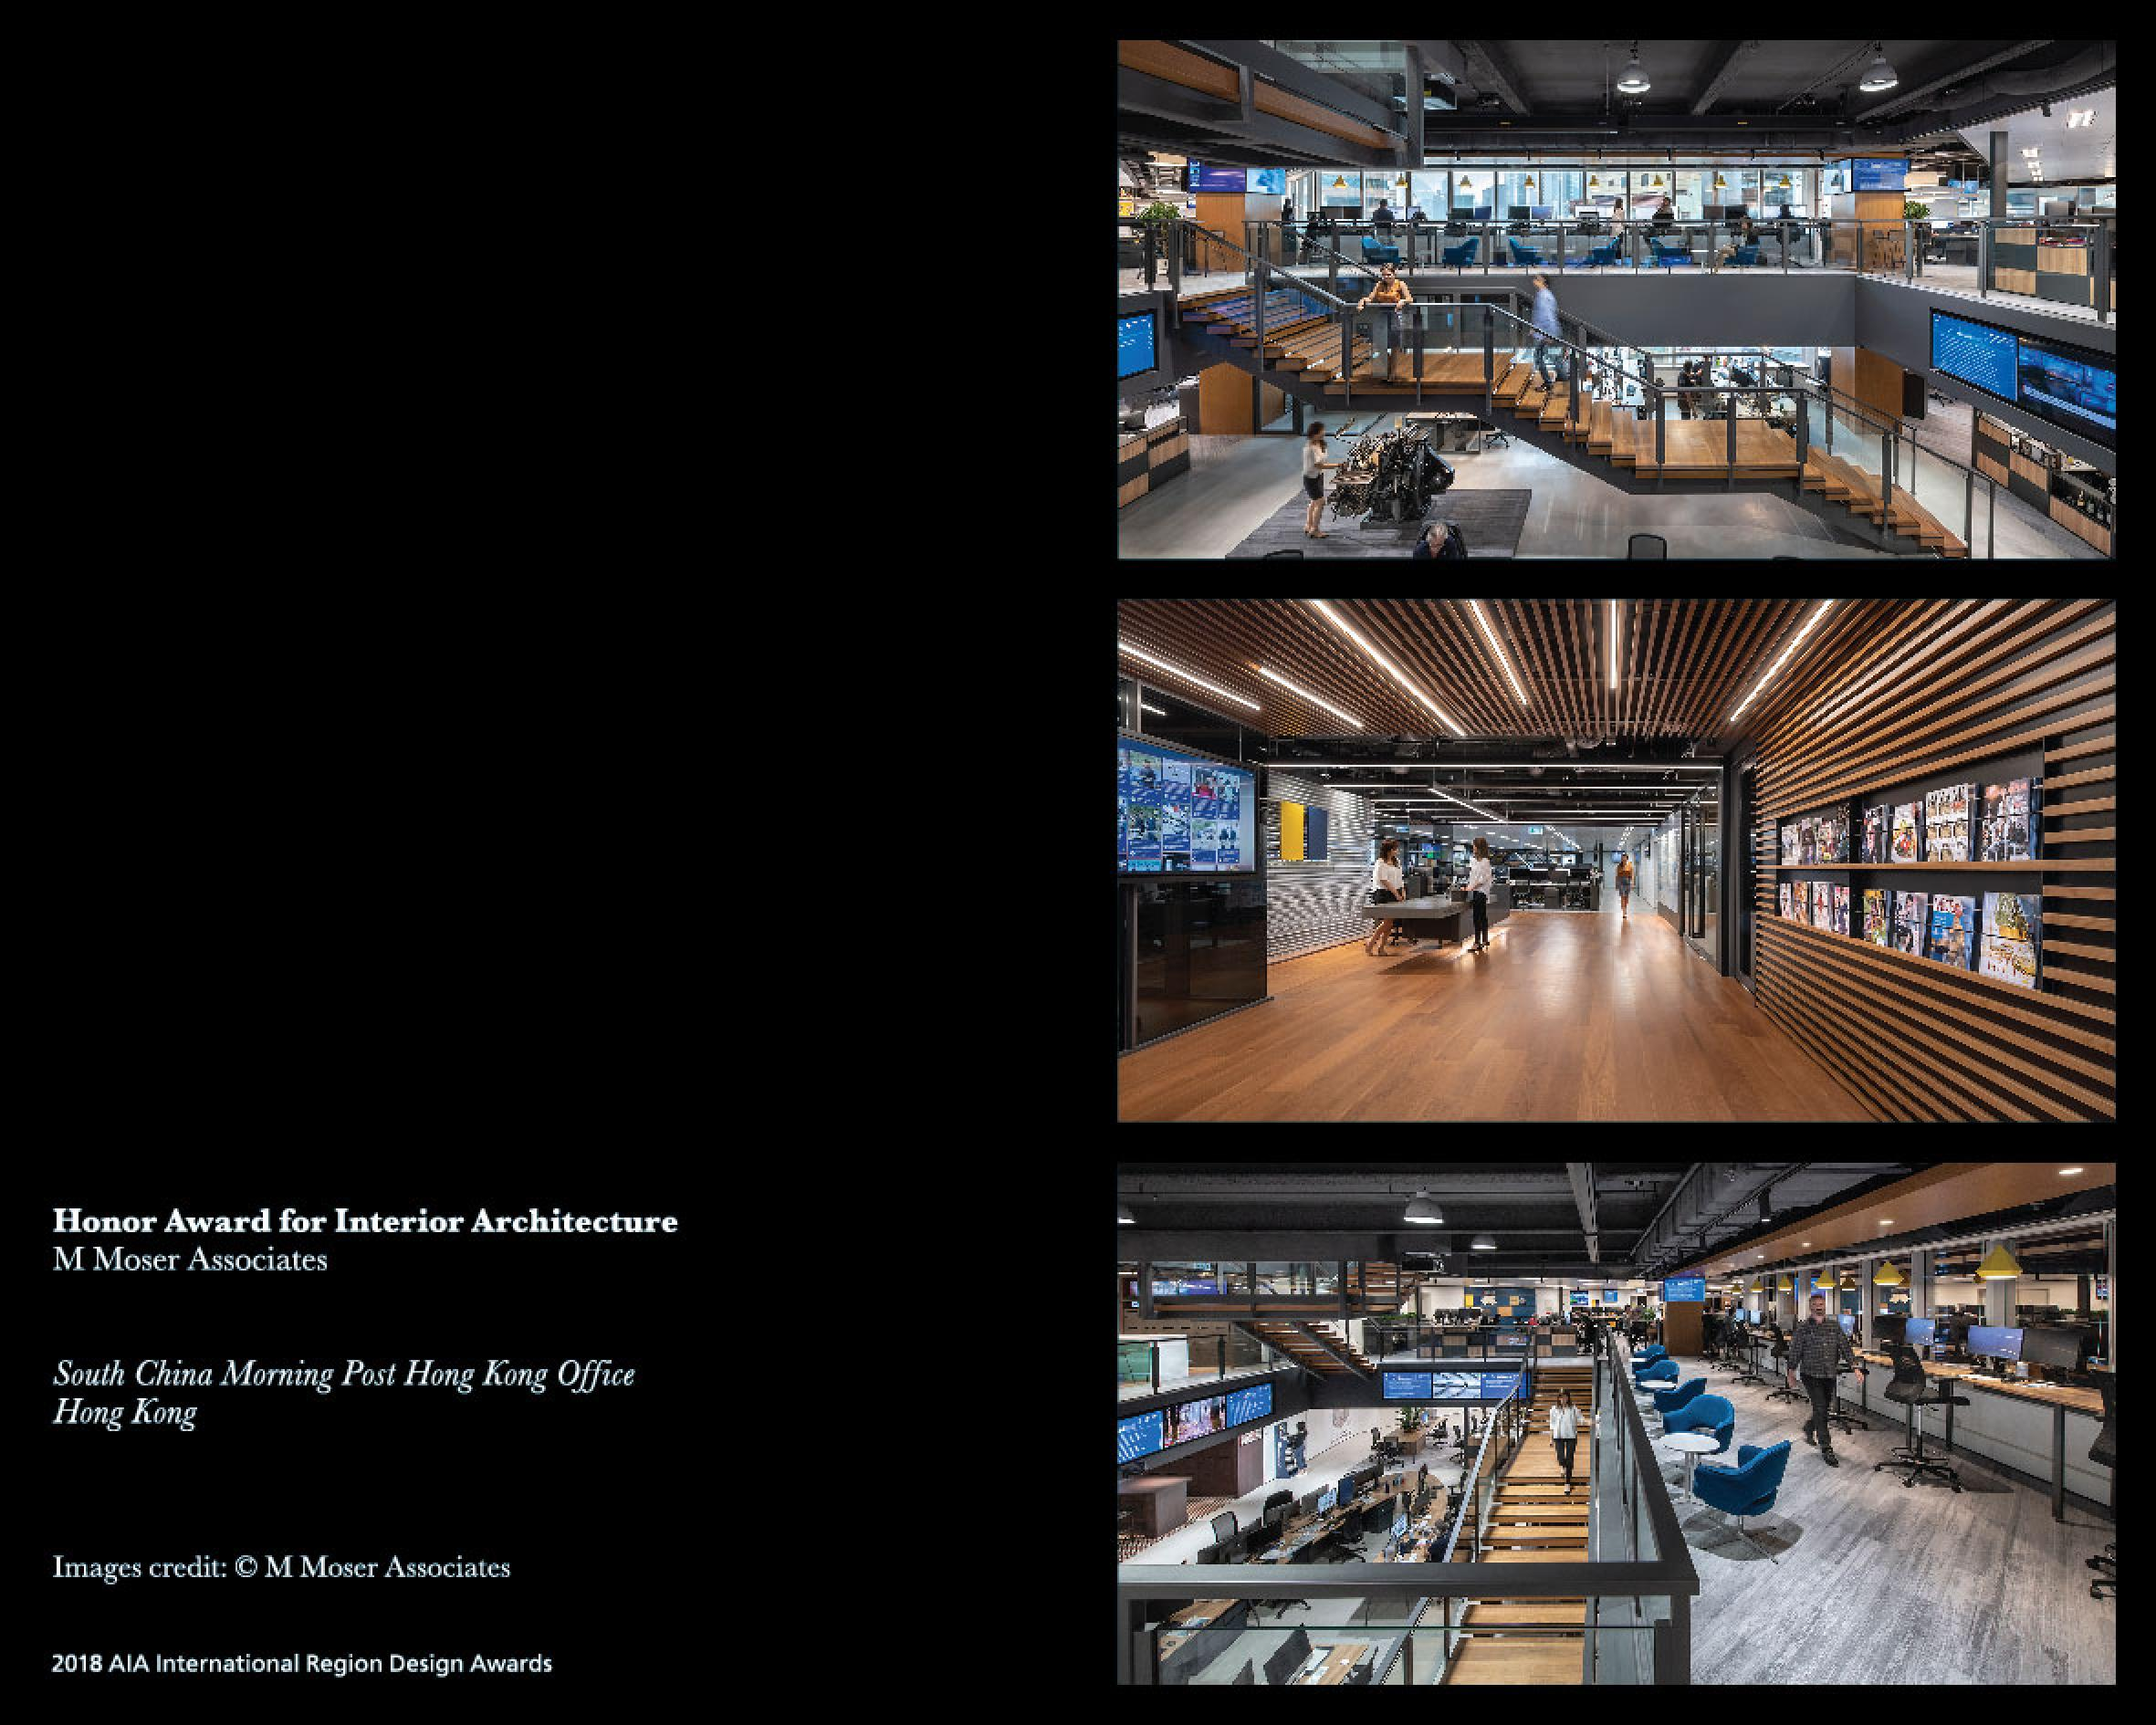 aiair design awards 2018 (11).jpg